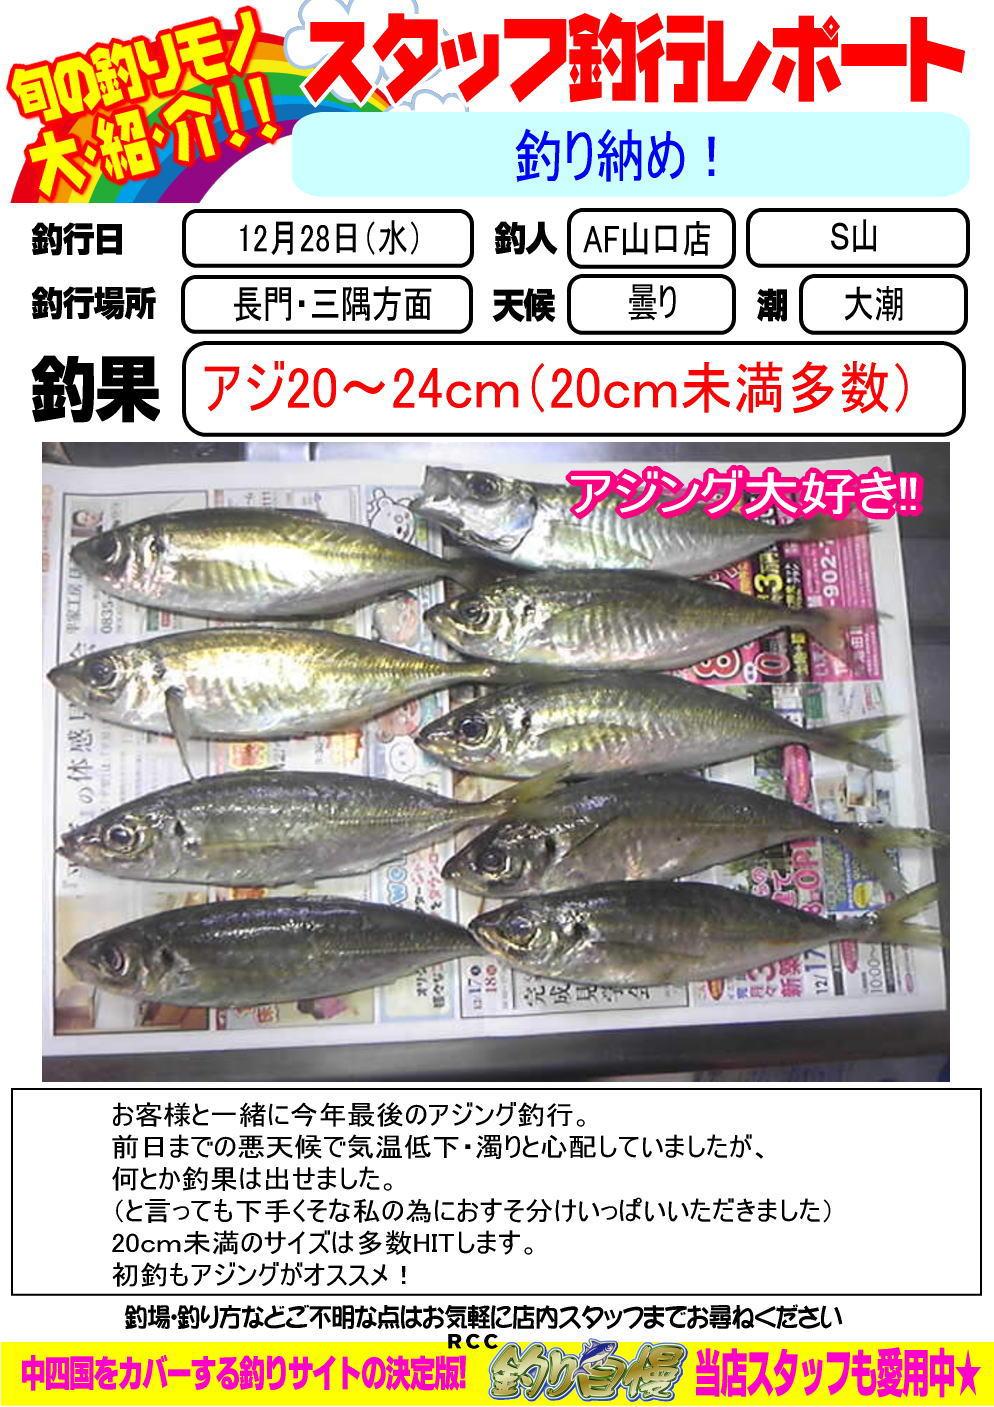 http://www.e-angle.co.jp/shop/blog/blog-20161228-yamaguchi-ajing.jpg